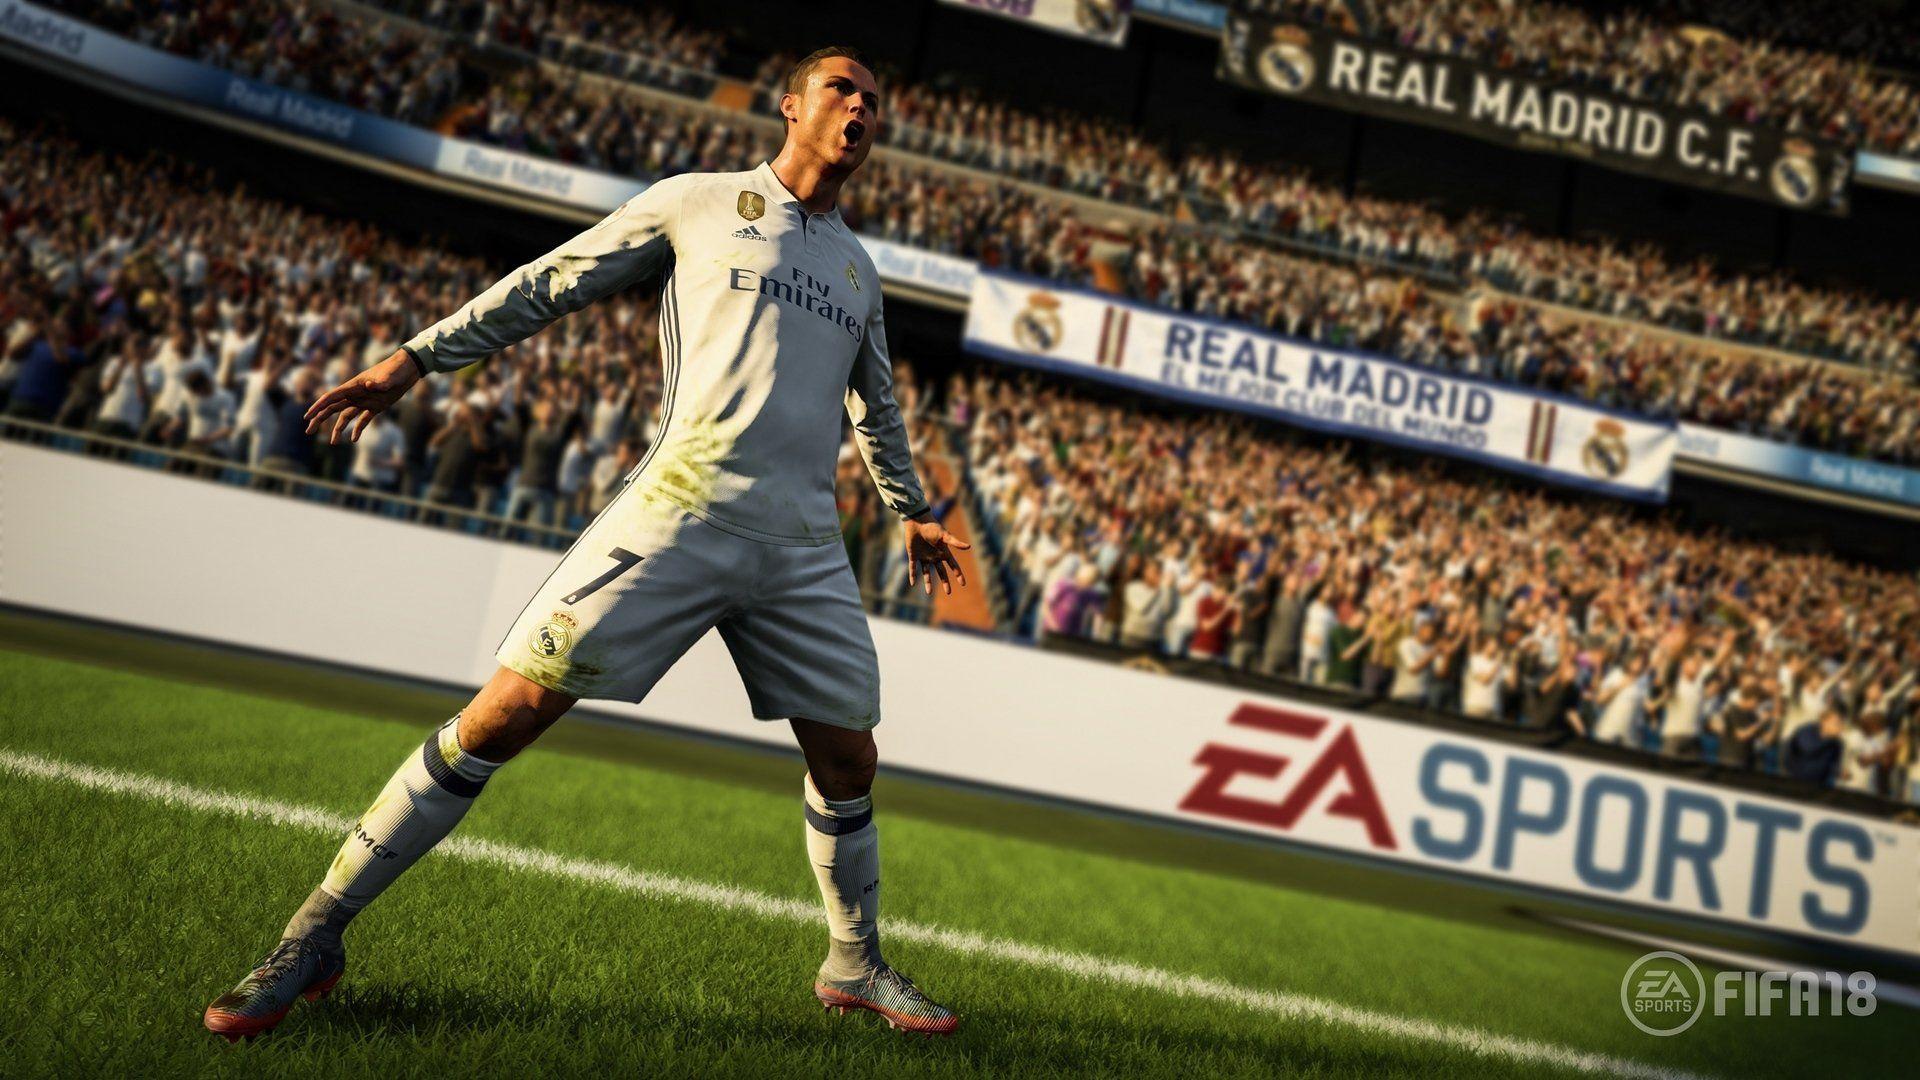 FIFA 18 iOS/APK Full Version Free Download